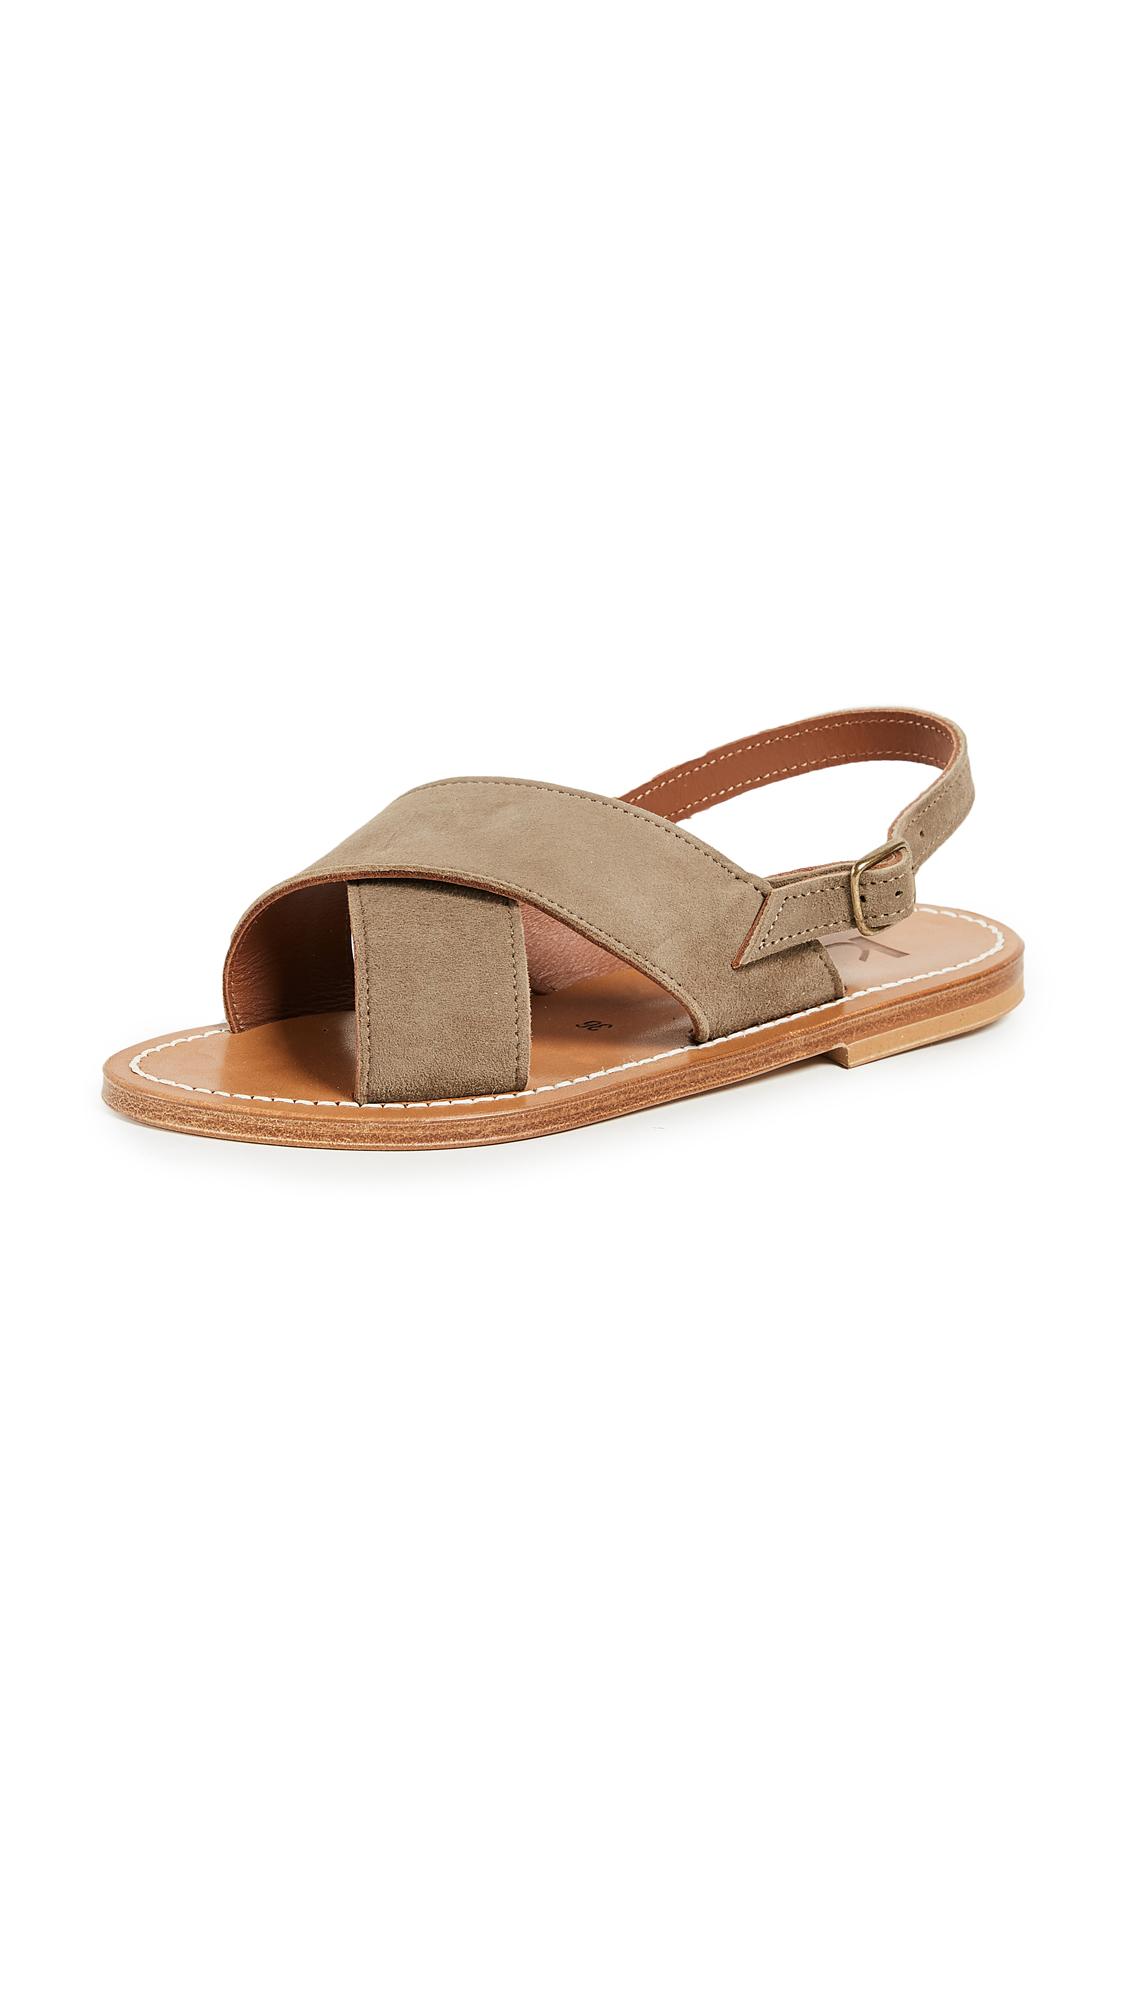 K. Jacques Osorno Crisscross Sandals - Velours Fango